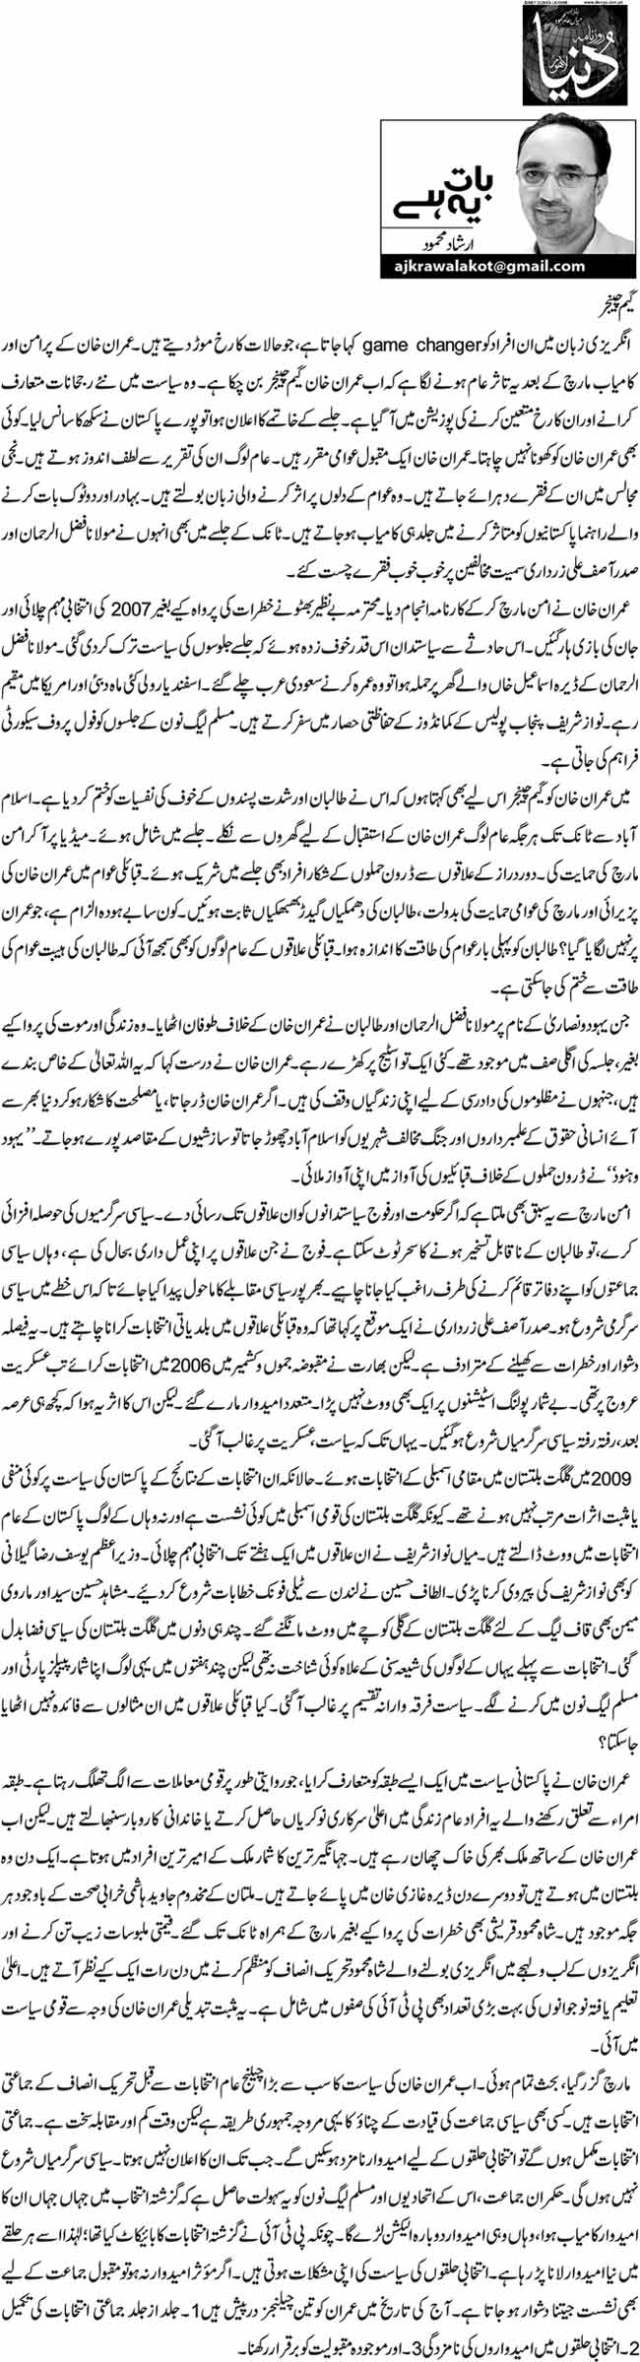 Game Changer - Irshad Mehmood